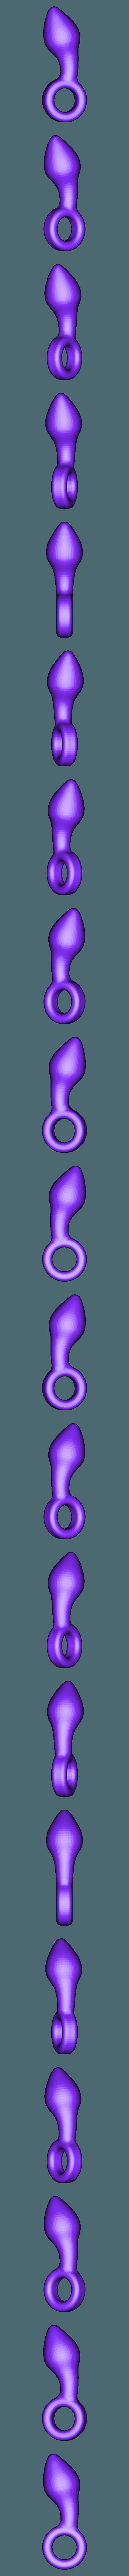 GspotPlug.STL Download STL file Gspot Plug Massa • 3D printable object, CoaBarba